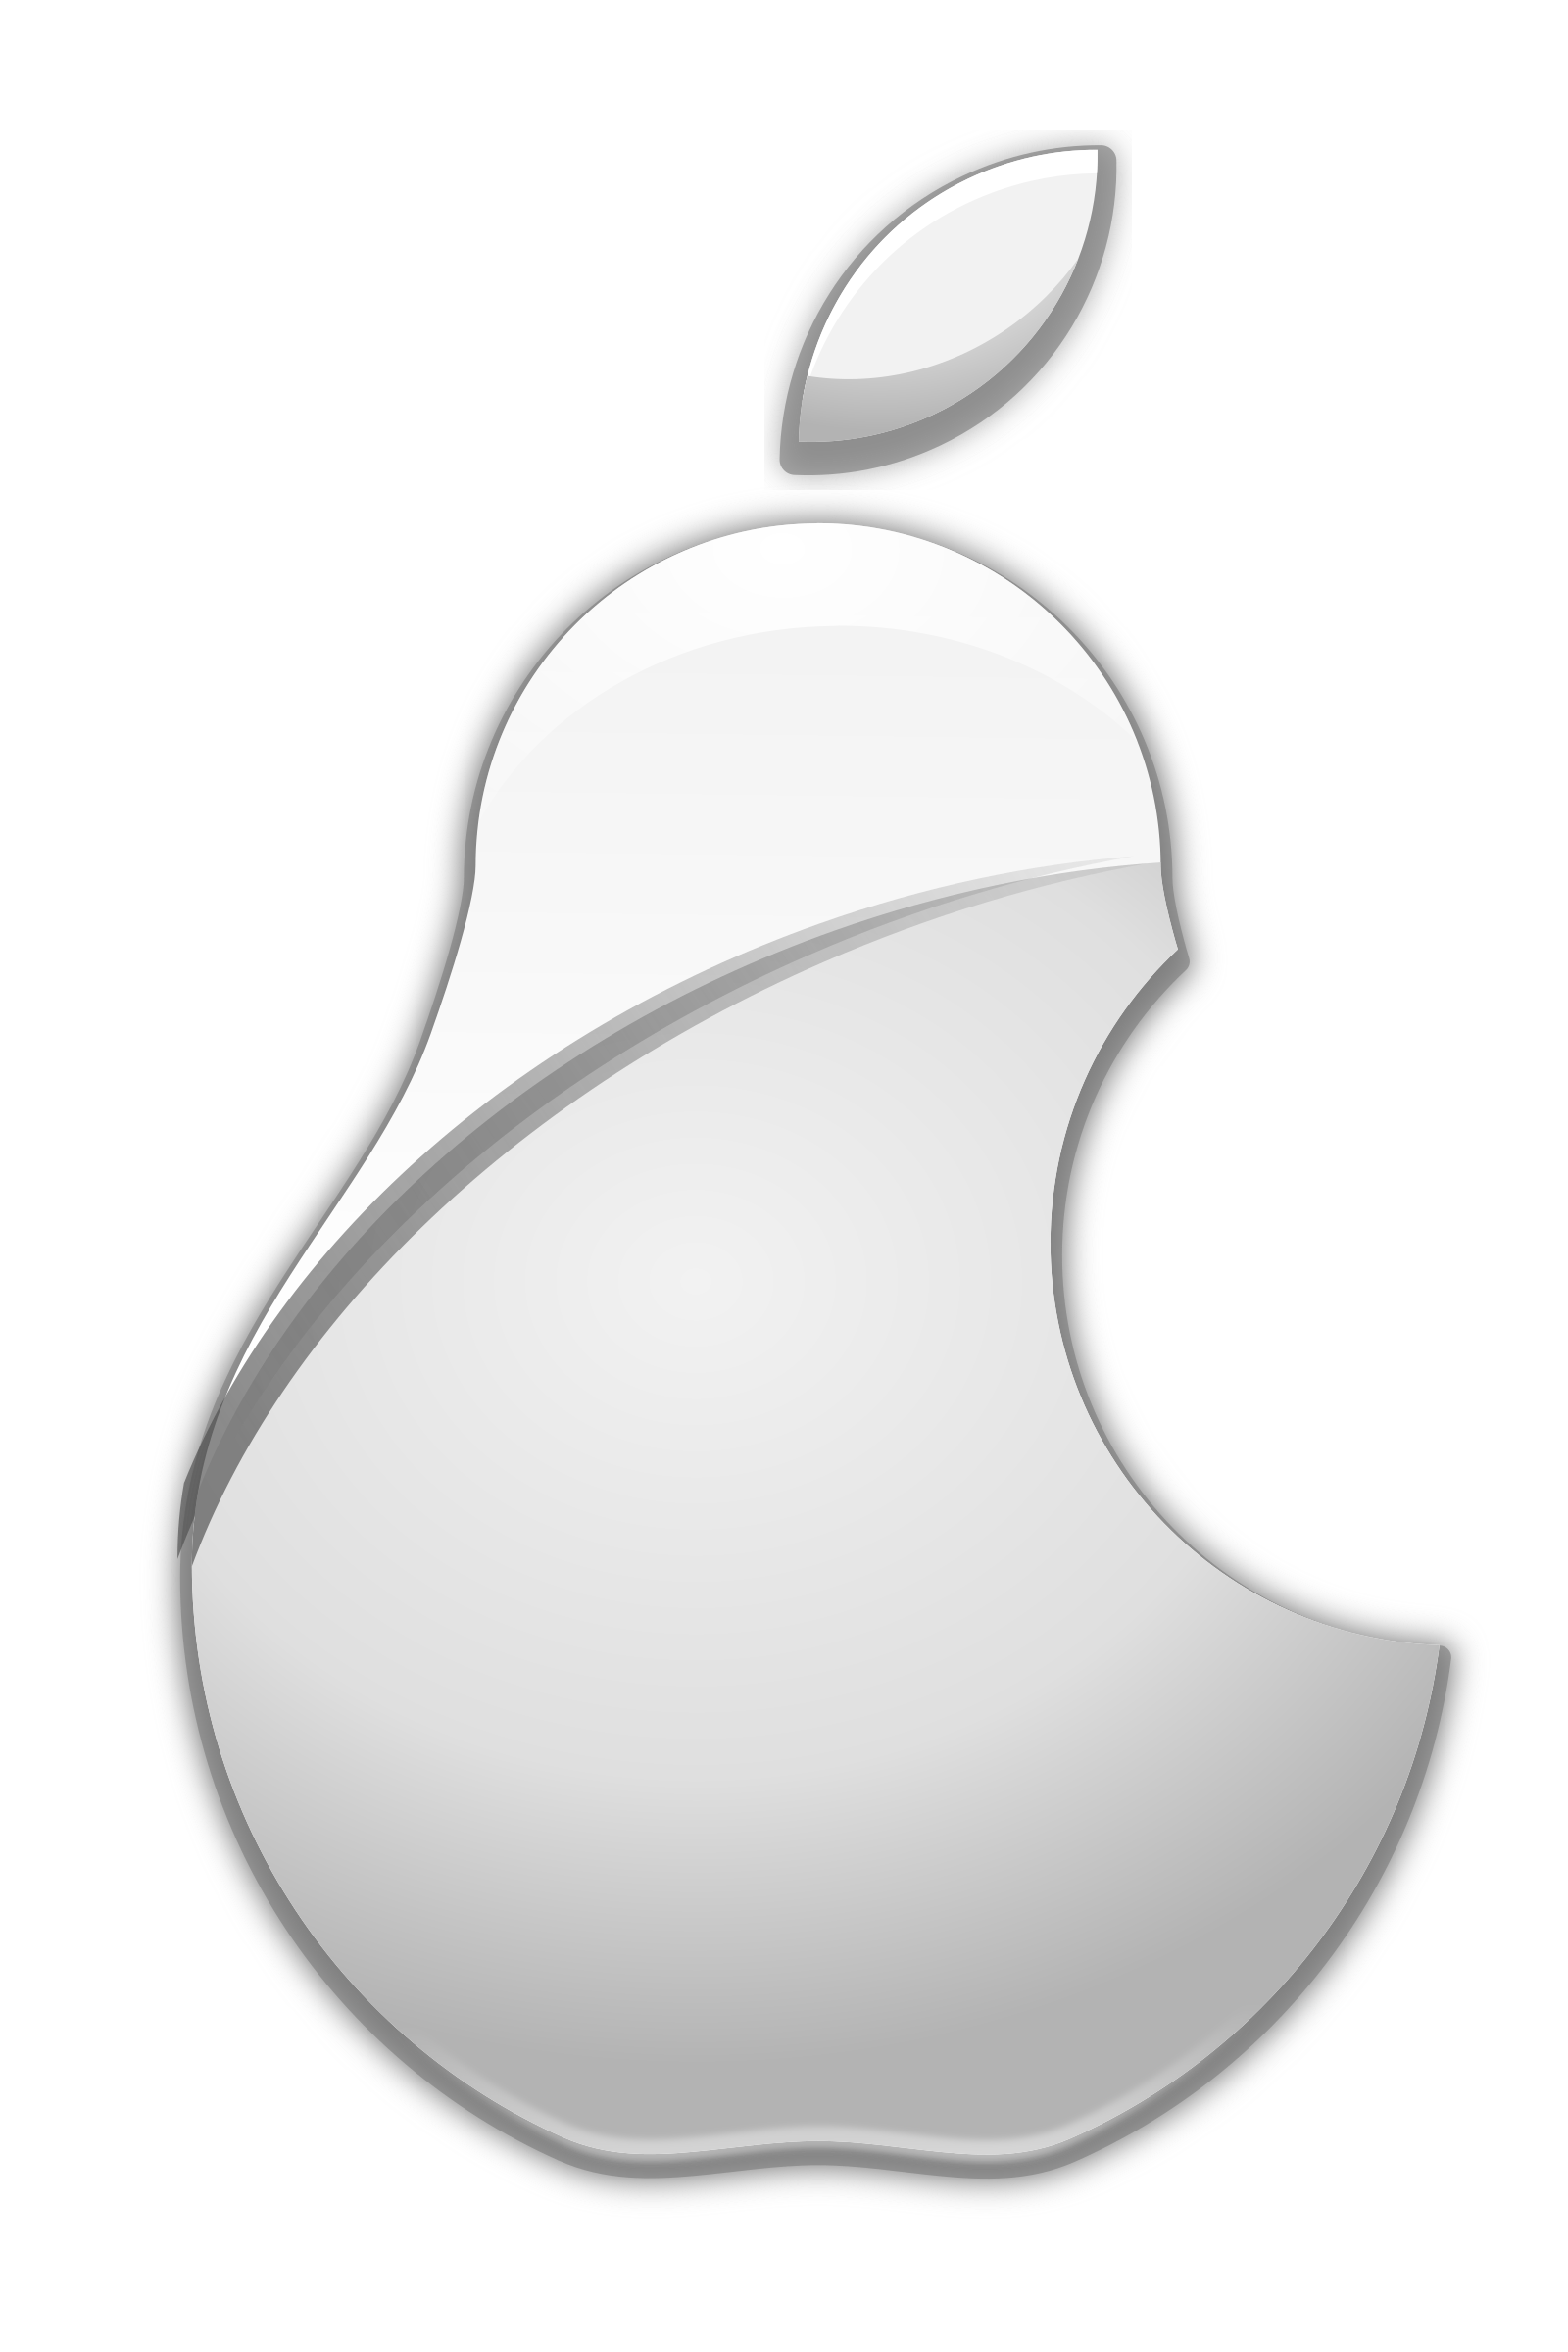 Logo big image png. Pear clipart bitten